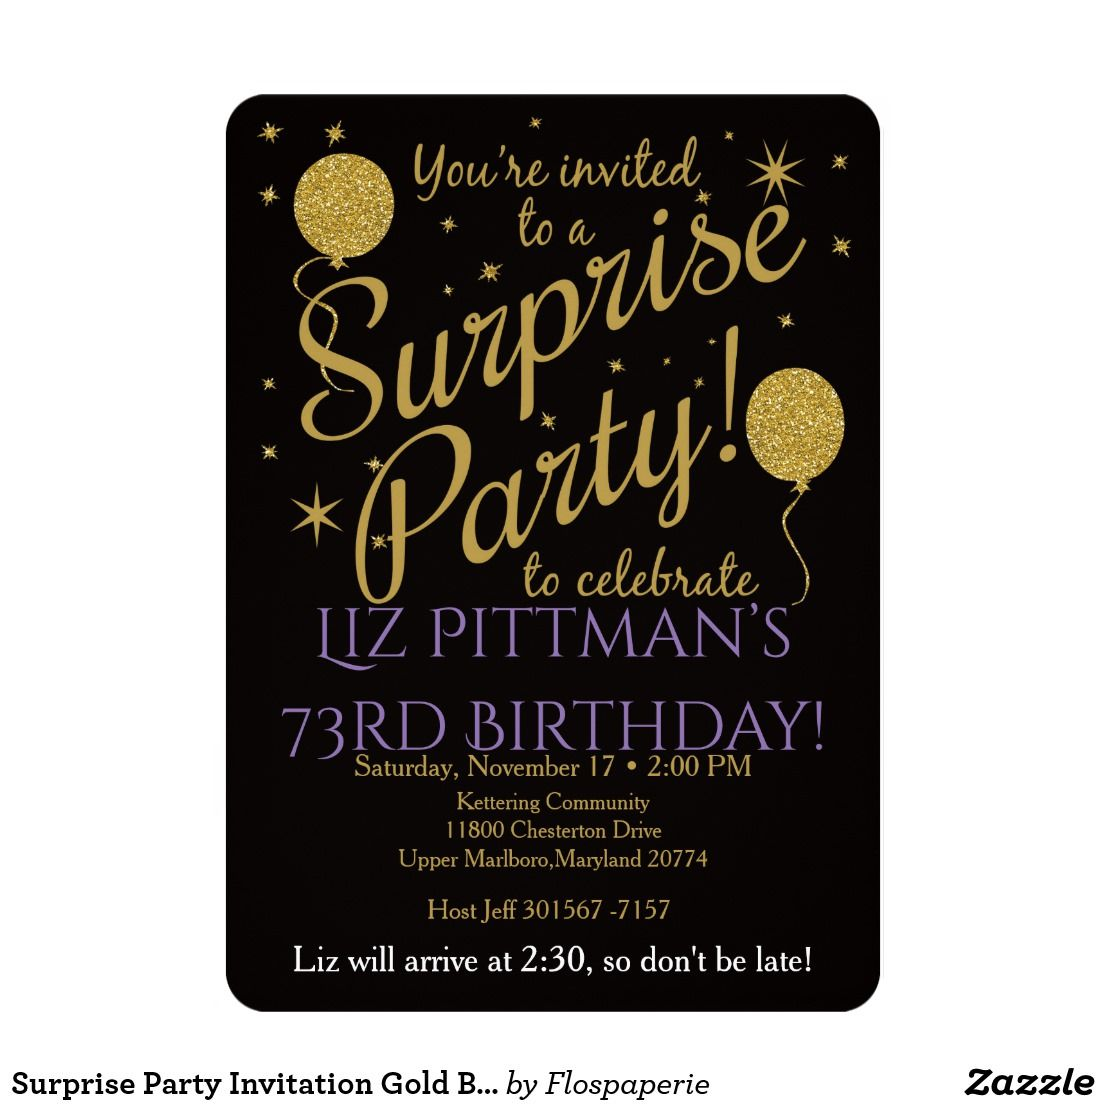 Surprise Party Invitation Gold Balloon Birthday Zazzle